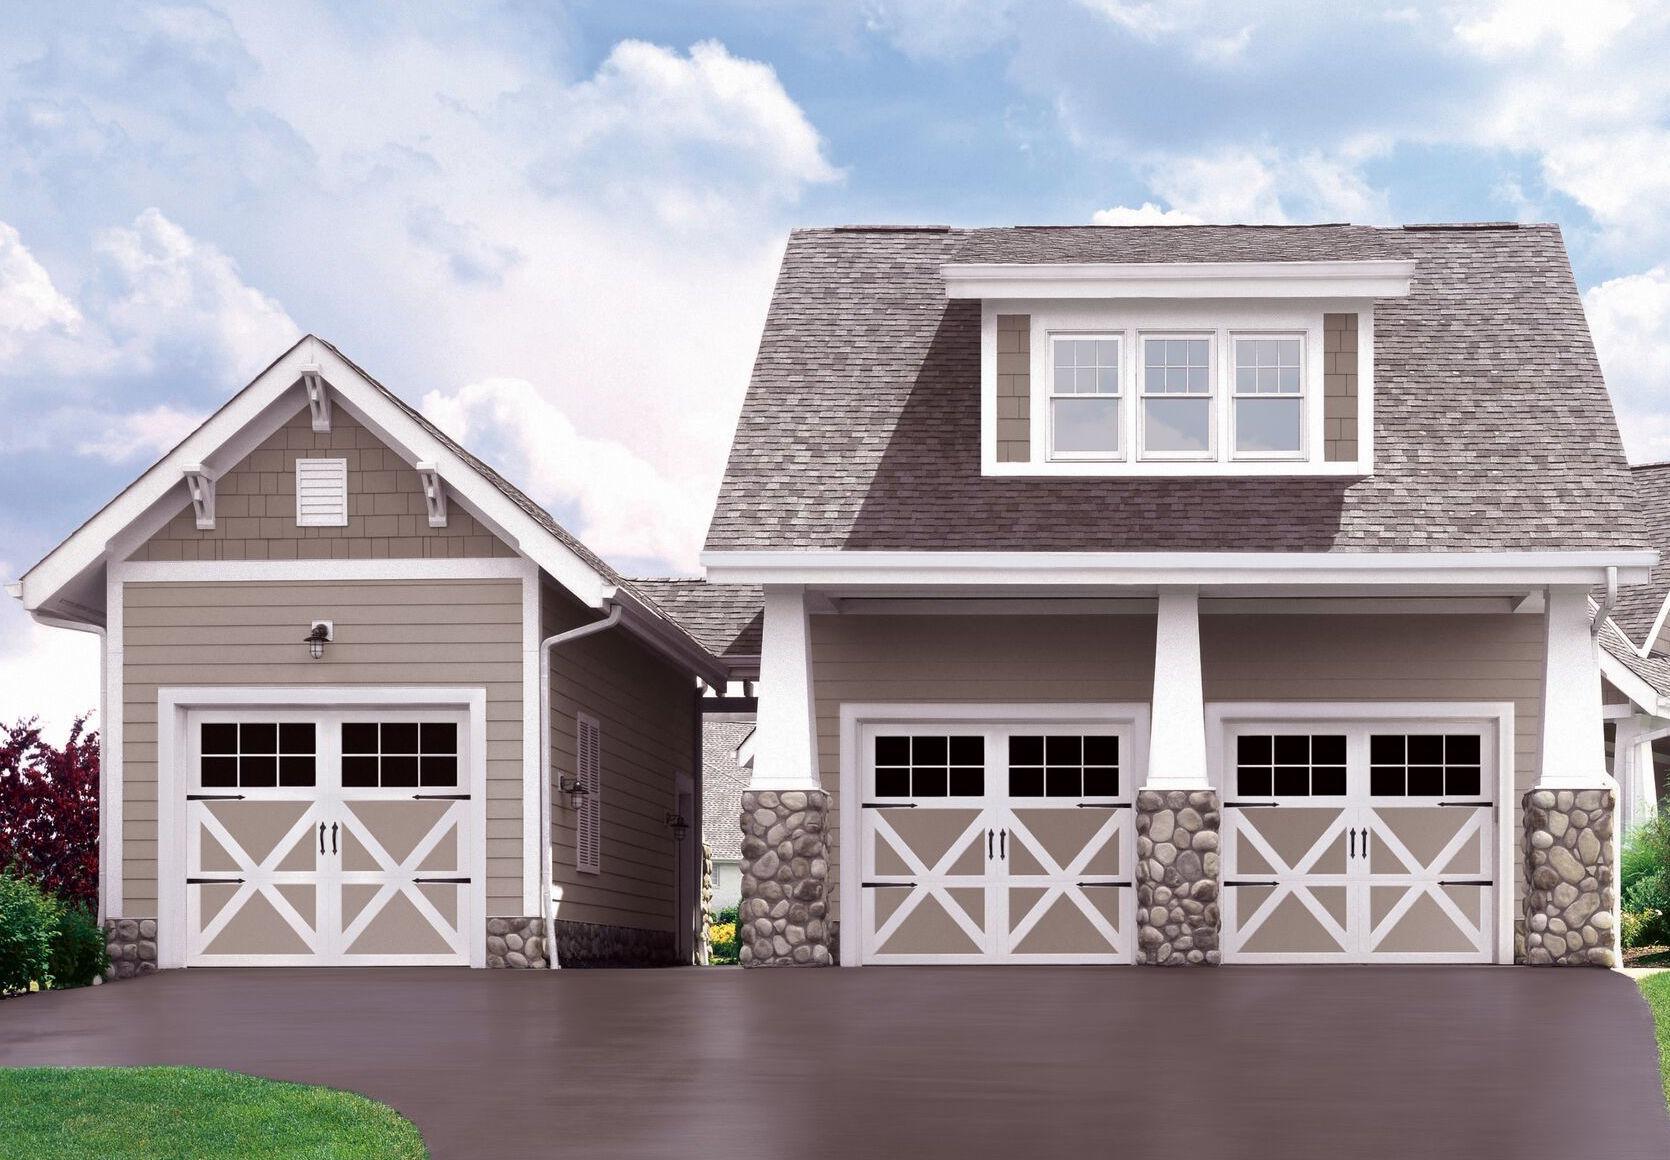 march 19 blog carriagehouse 9700 lexington high preview jpeg wayne dalton designer fiberglass doors  [ 1670 x 1160 Pixel ]